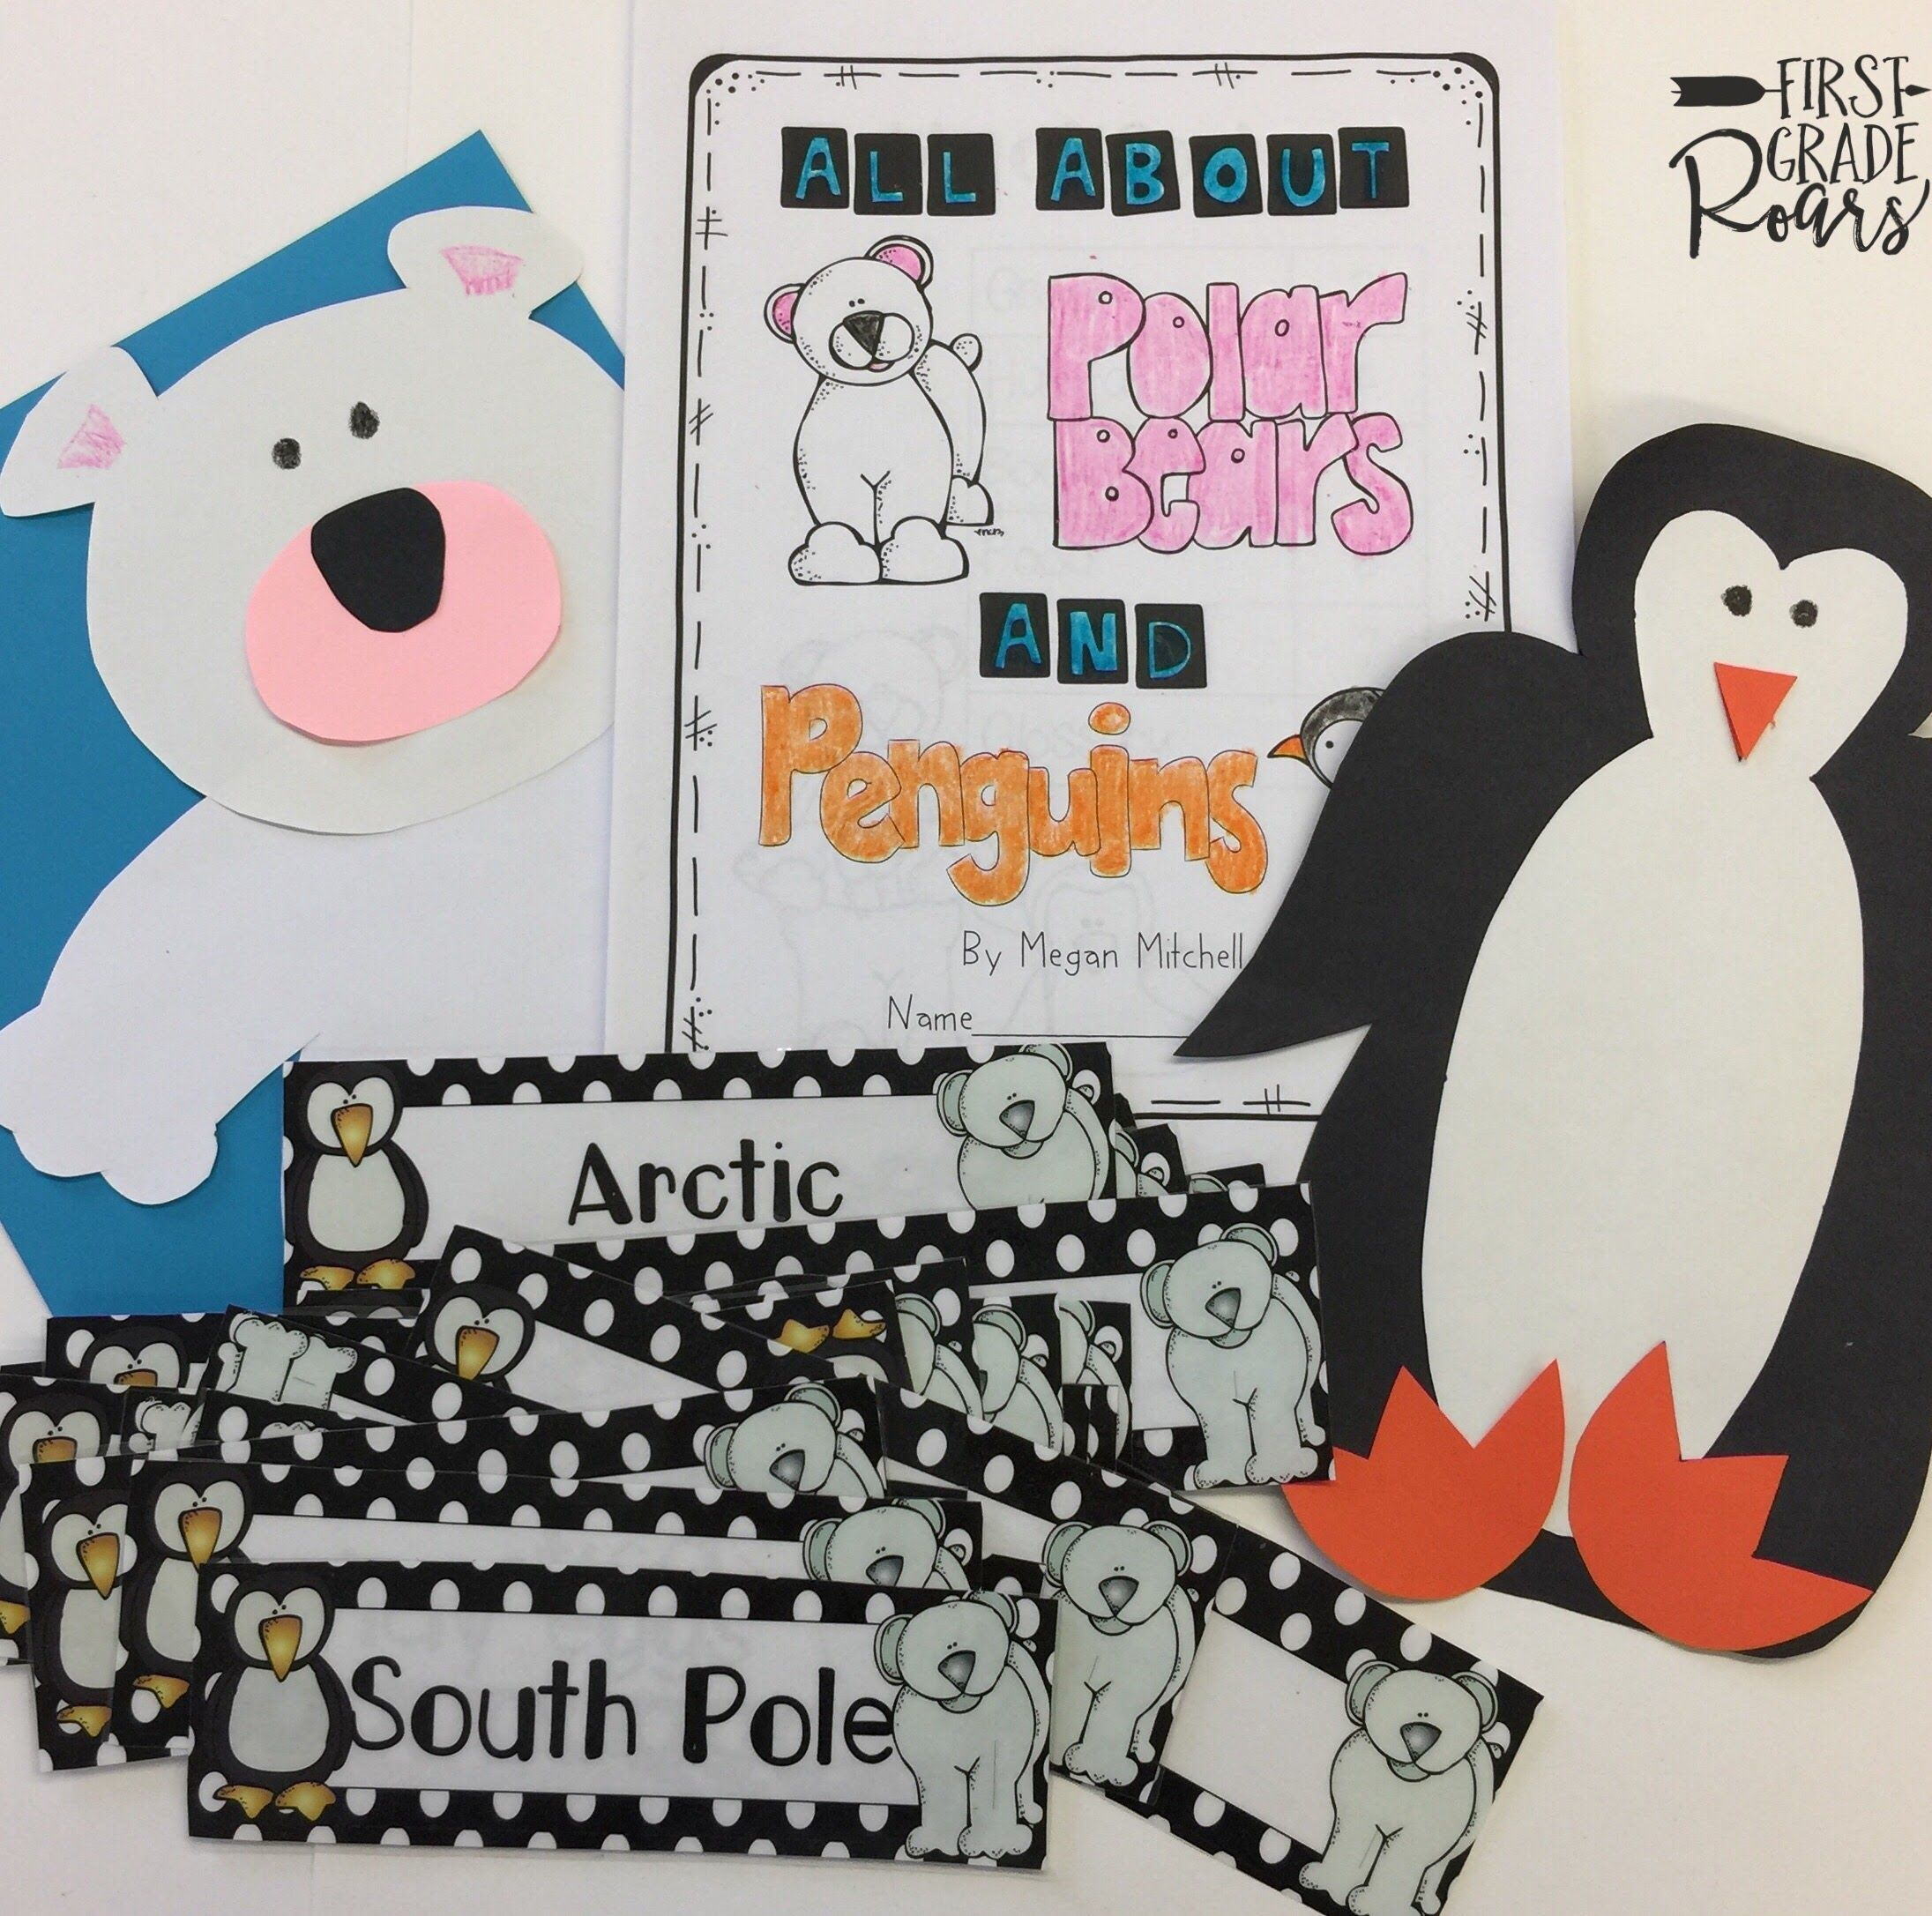 Polar Bears Vs Penguins A Mini Unit On Compare And